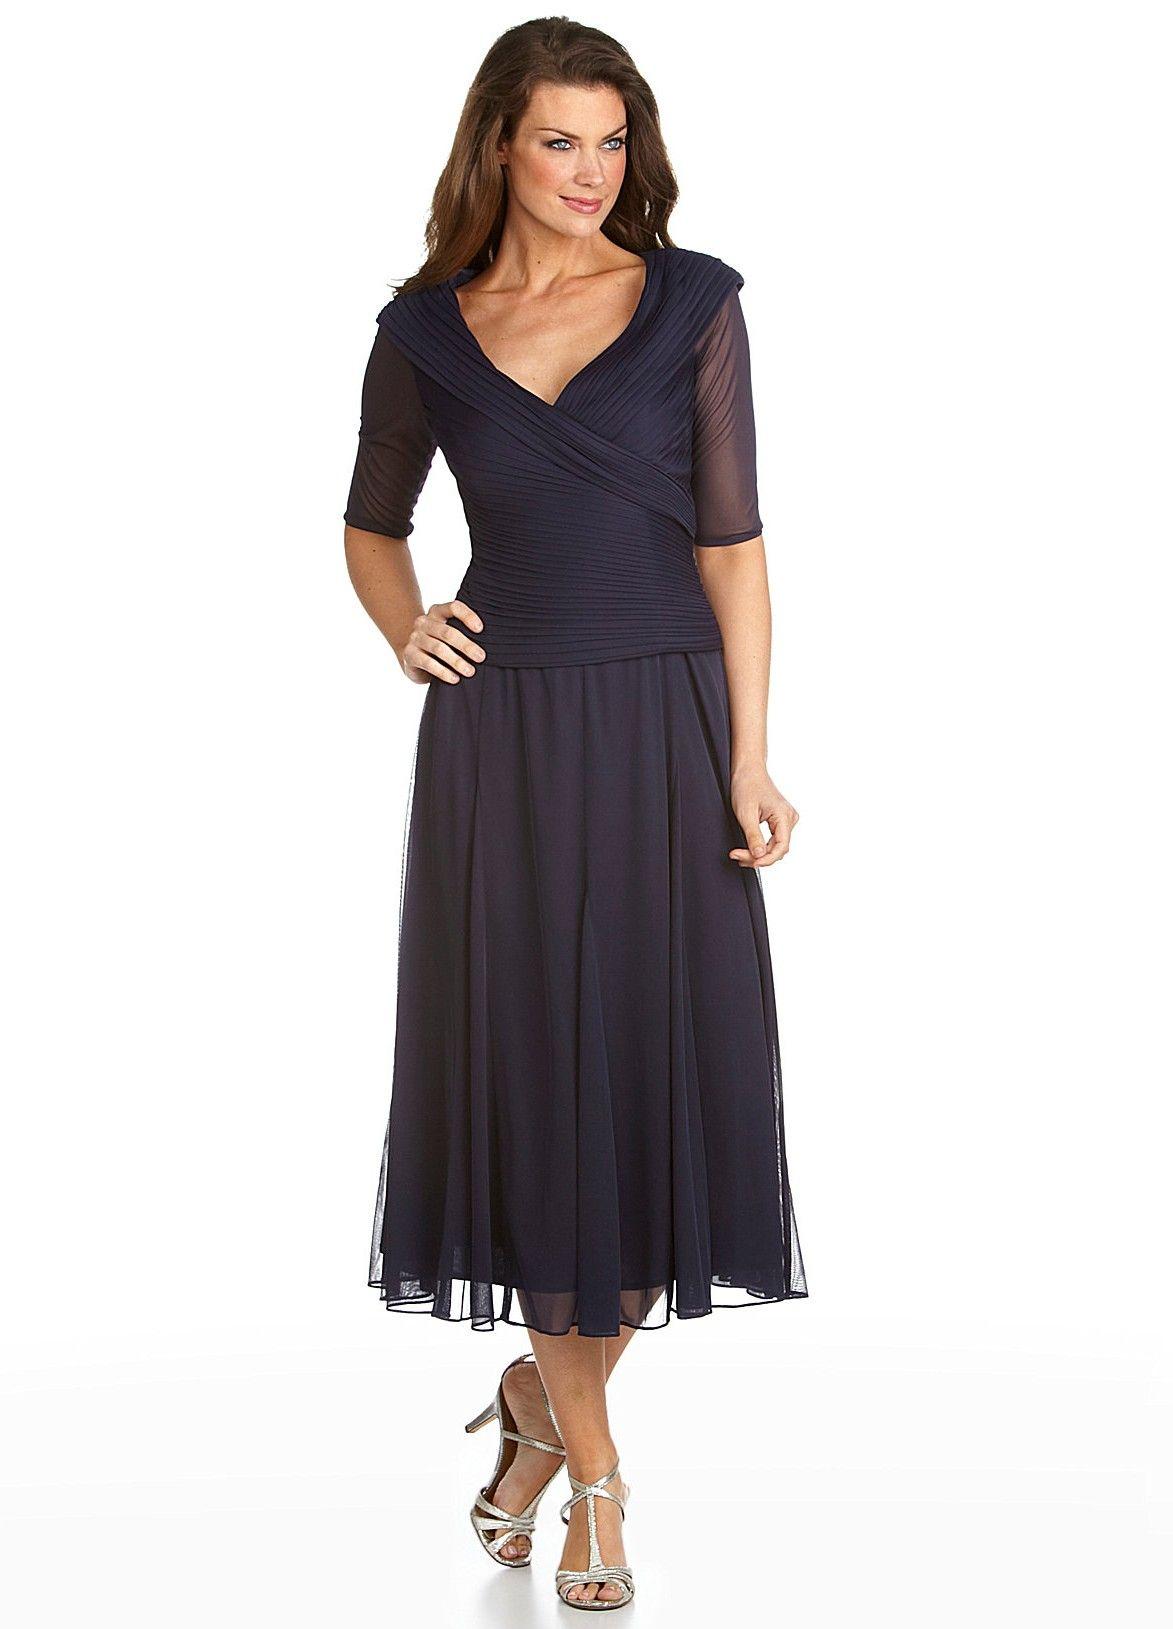 Wedding dresses tea length  Alex Evenings  Mesh Portrait Tea Length Dress  Pretty dress